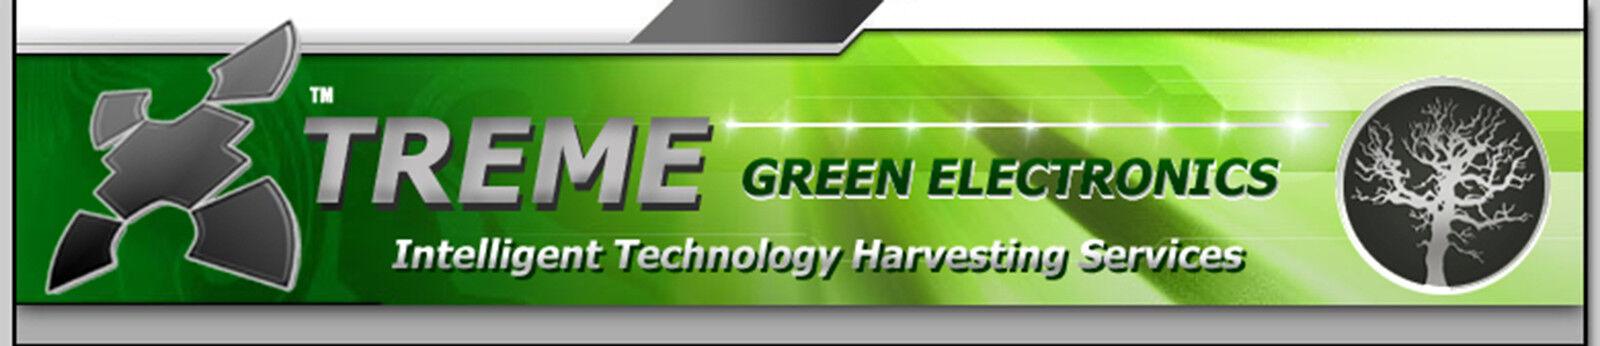 Xtreme Green Electronics